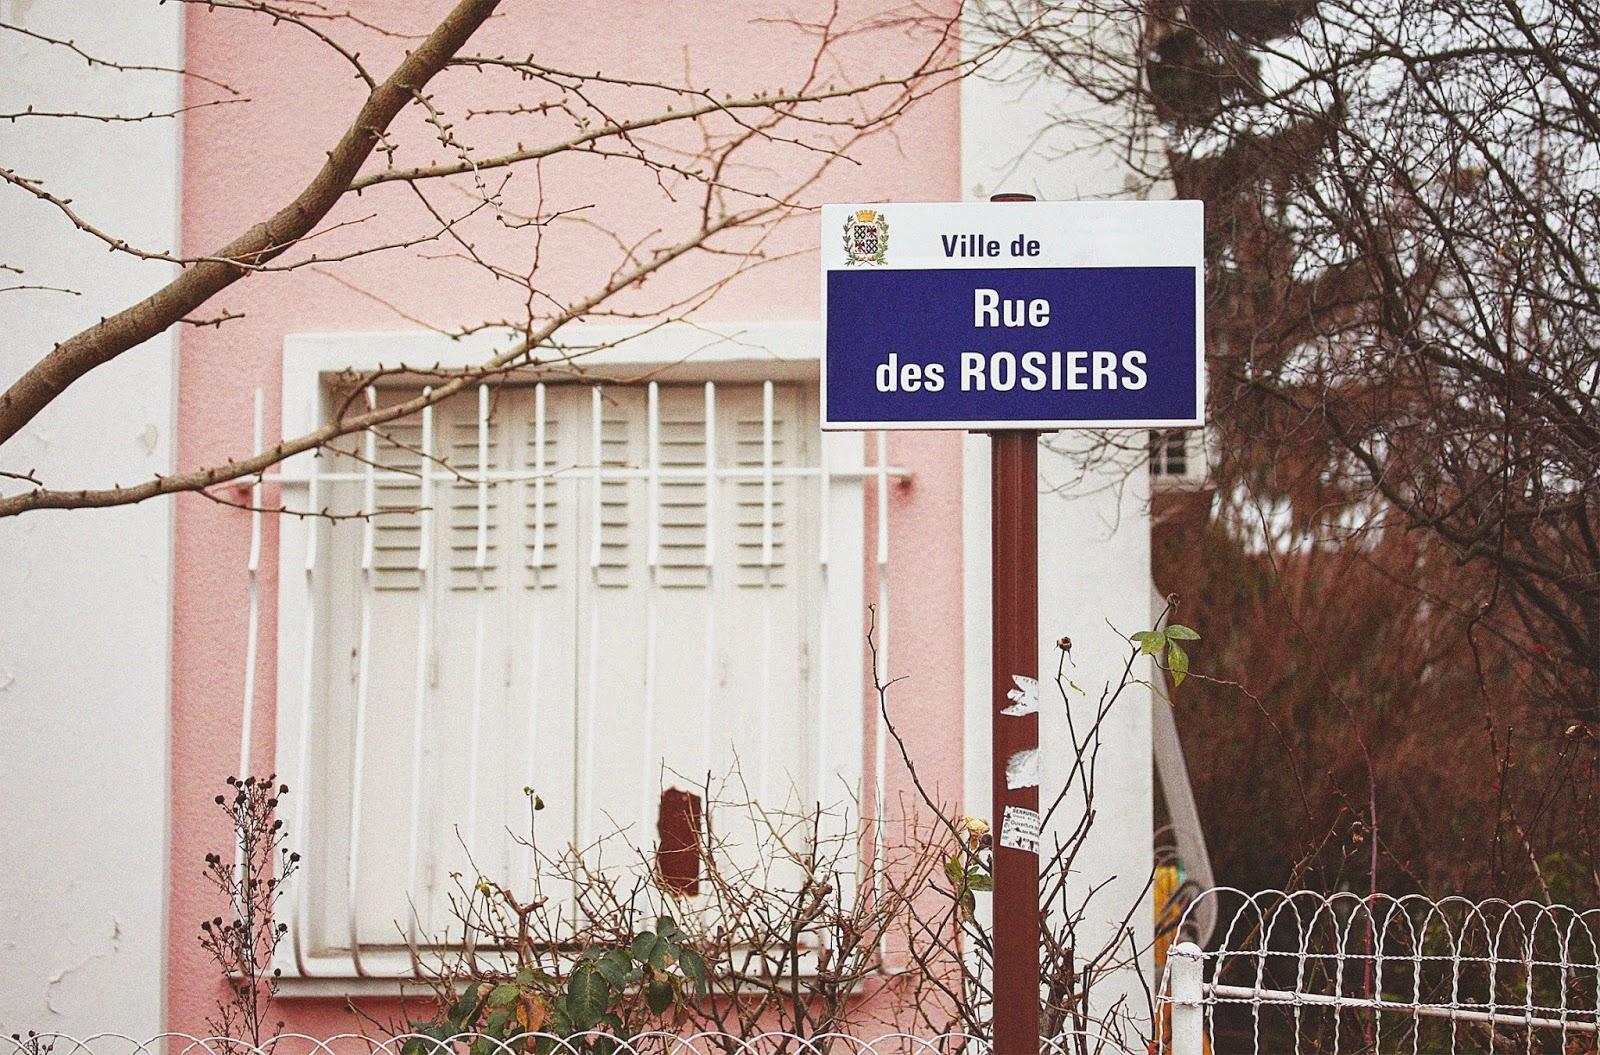 http://rosemademoiselle.blogspot.com/2015/01/la-rue-des-rosiers.html